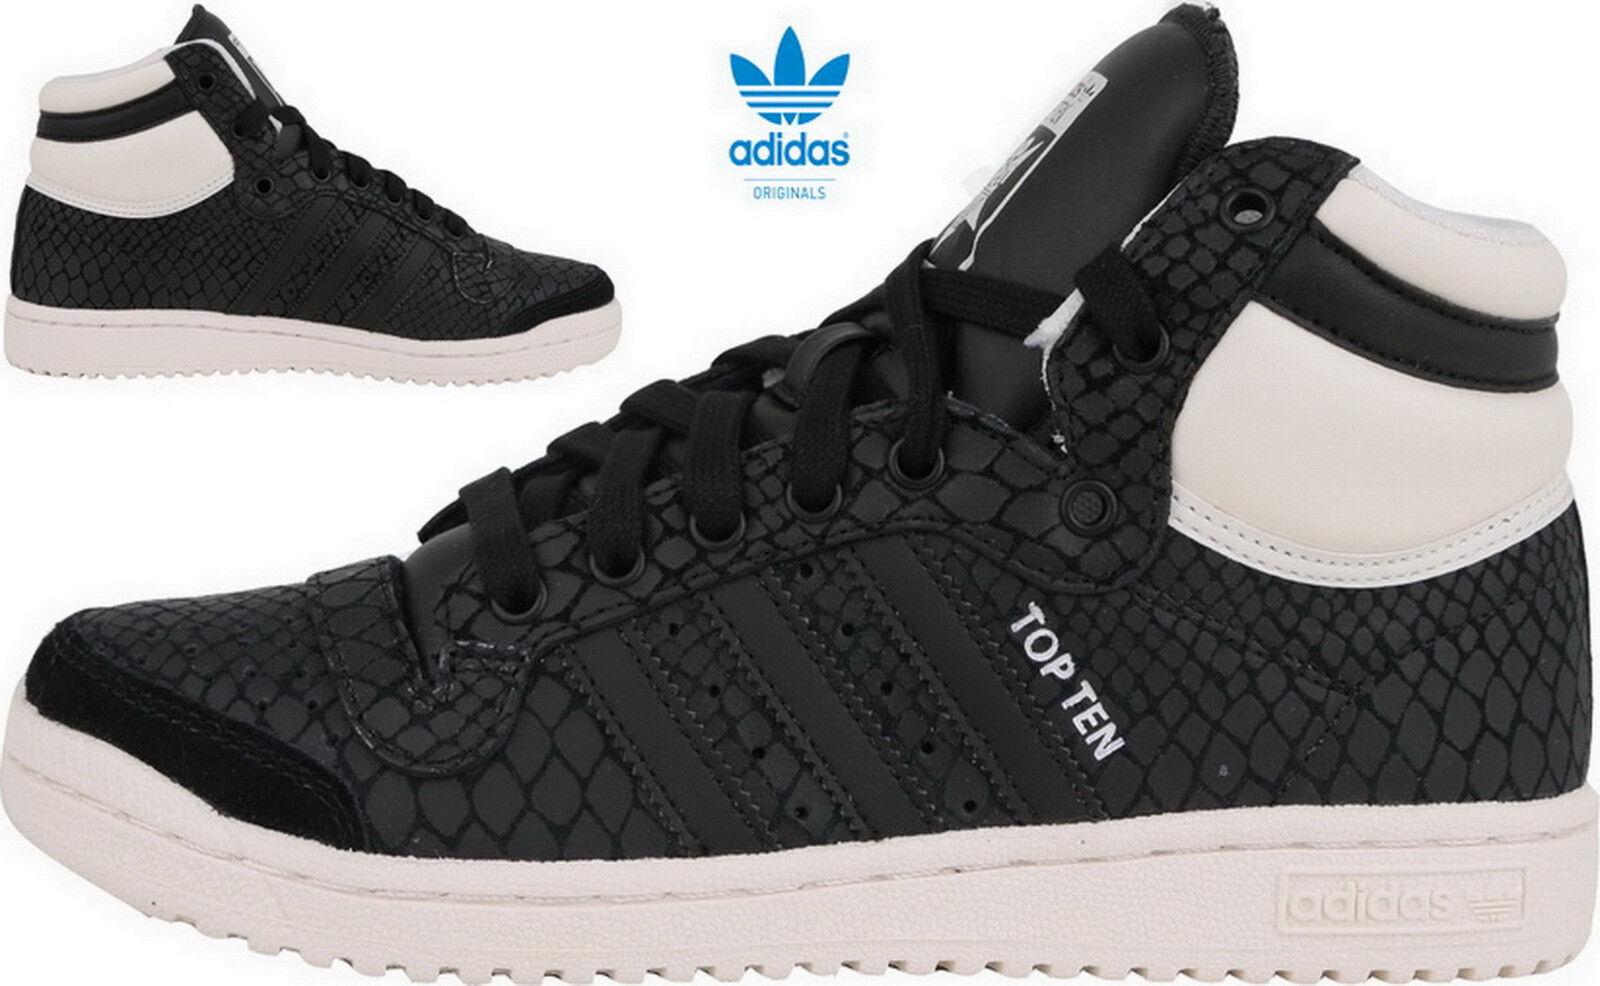 Adidas Originals Top Ten Hi W Originals Adidas Damen Sneaker Turnschuhe Schwarz S75135 da02bf